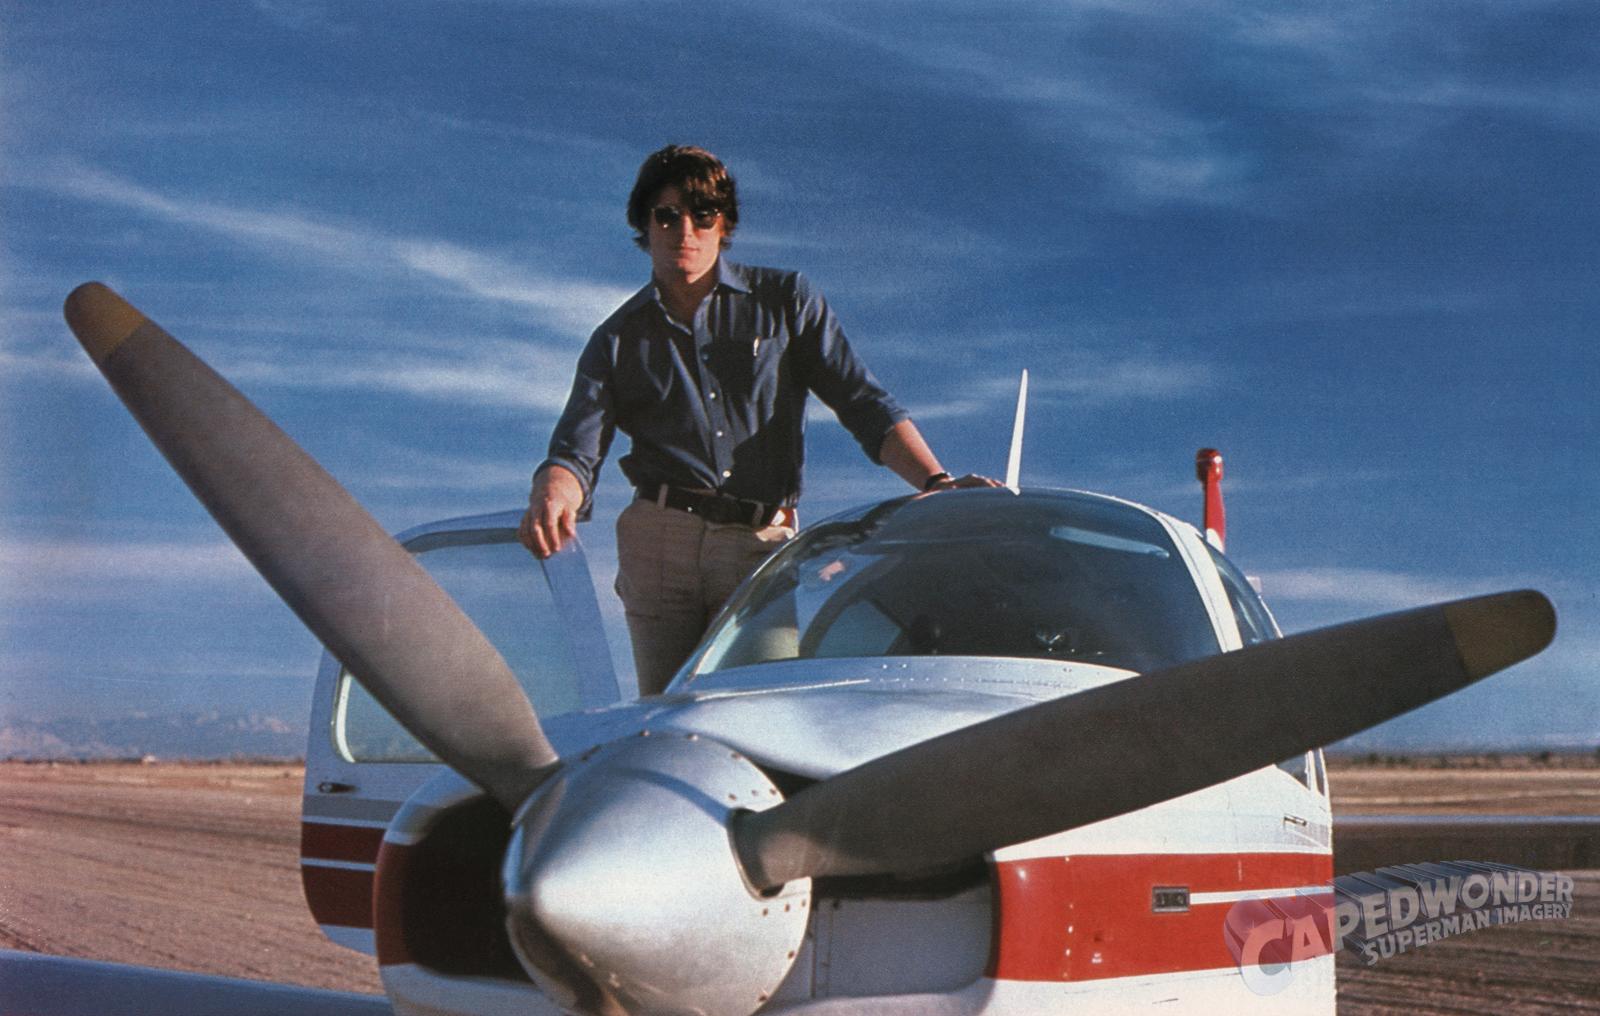 CW-Chris-Reeve-airplane